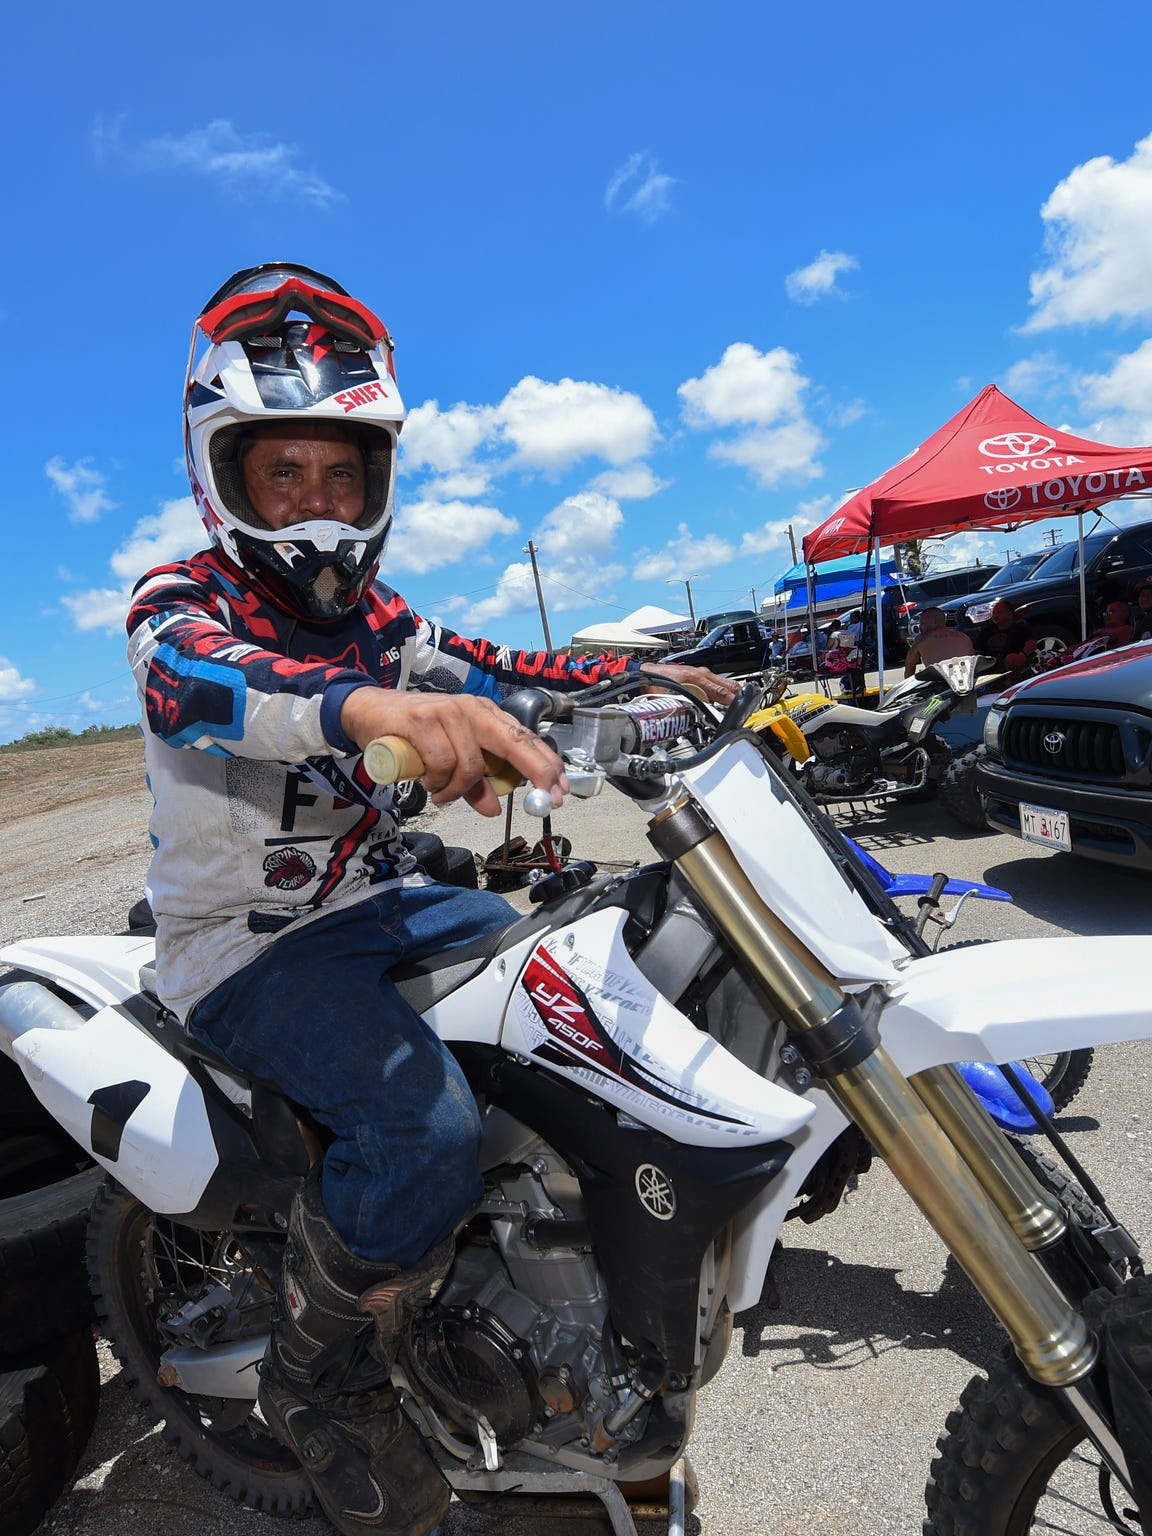 Motocross rider John Aguon, Sr., poses on his dirt bike during the Monster Energy 2016 Guam Motocross Championship at the Guam International Raceway in Yigo on June 12.